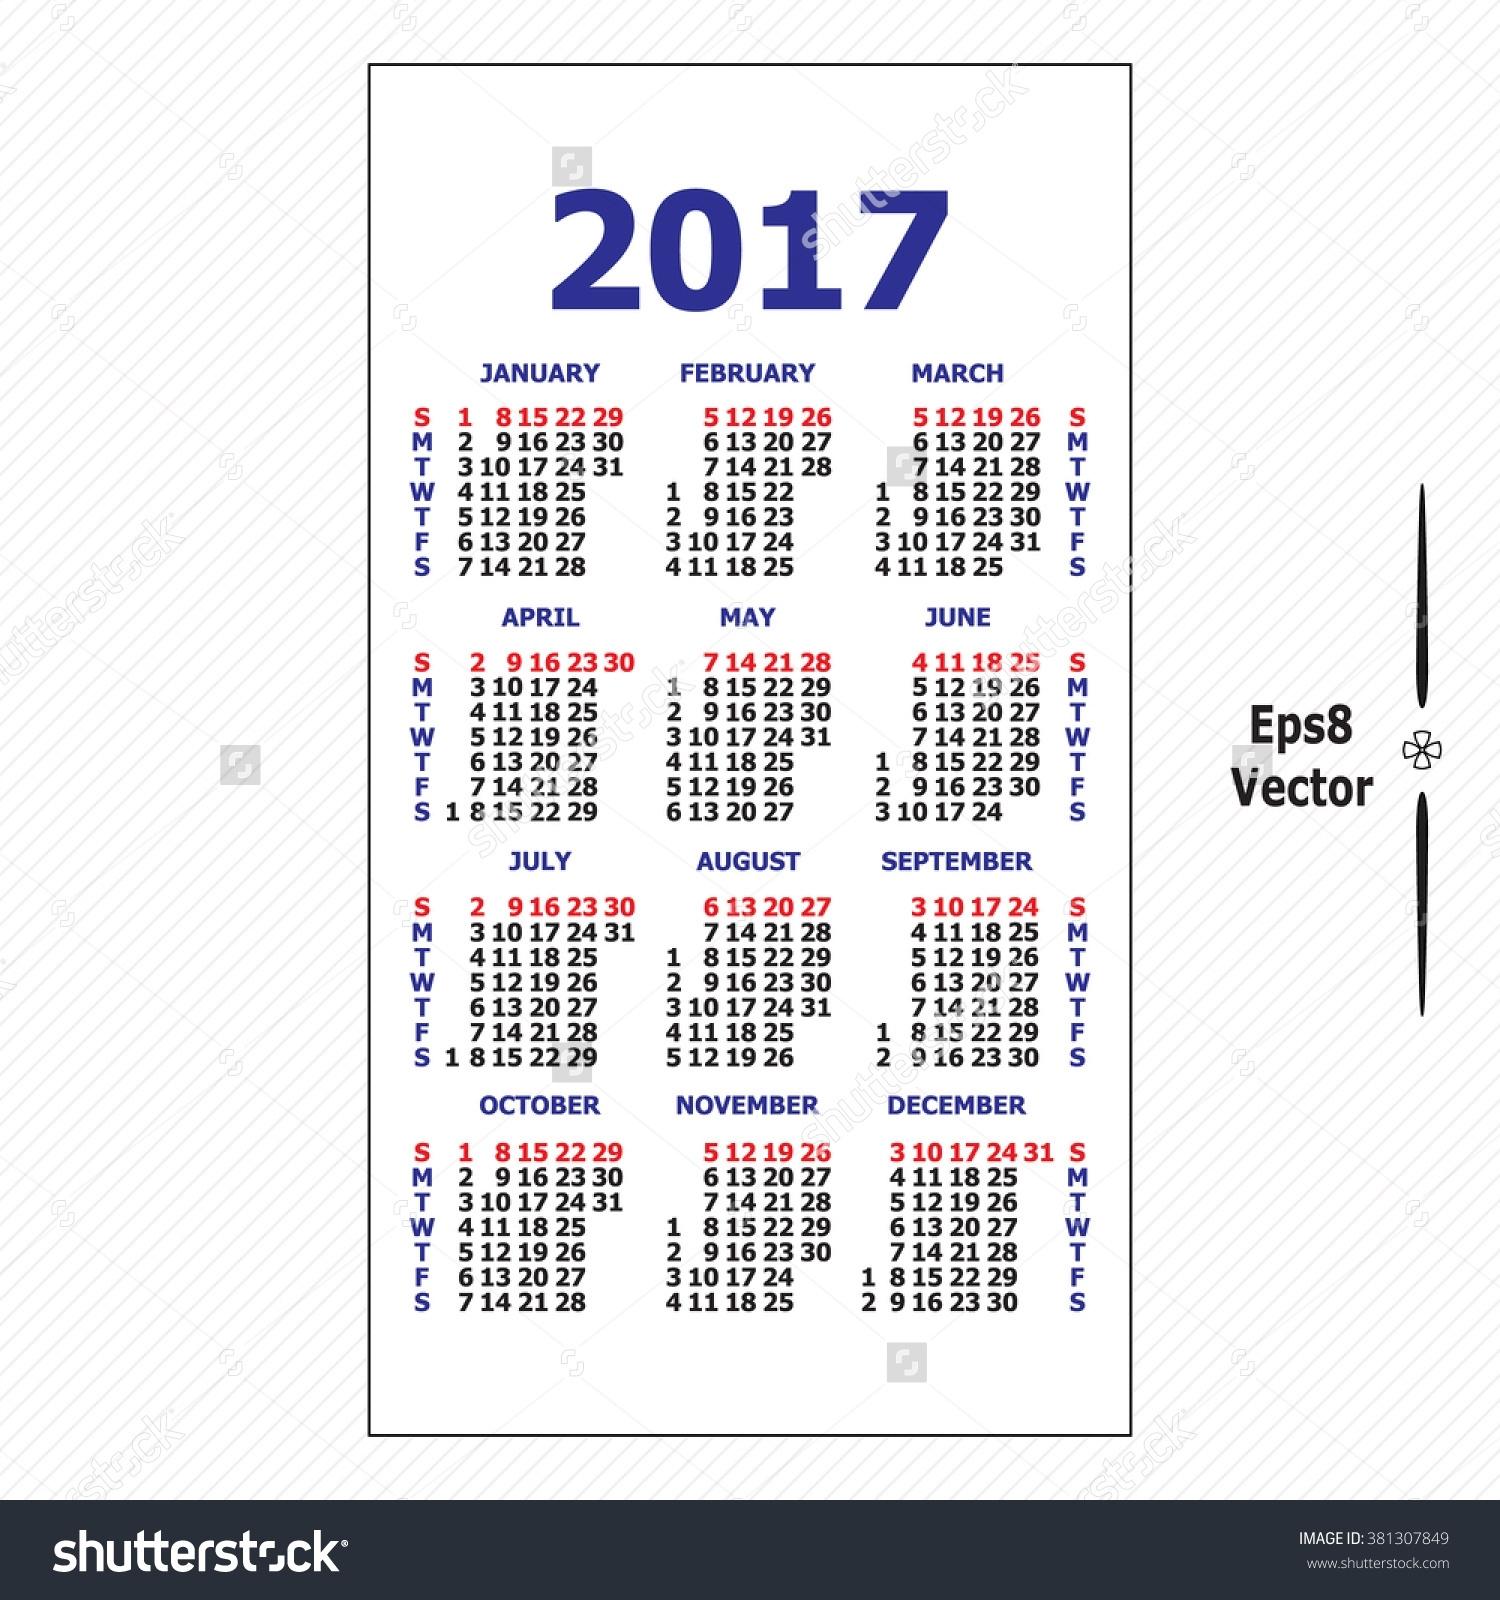 Template For Pocket Sized Calendar Calendar Inspiration